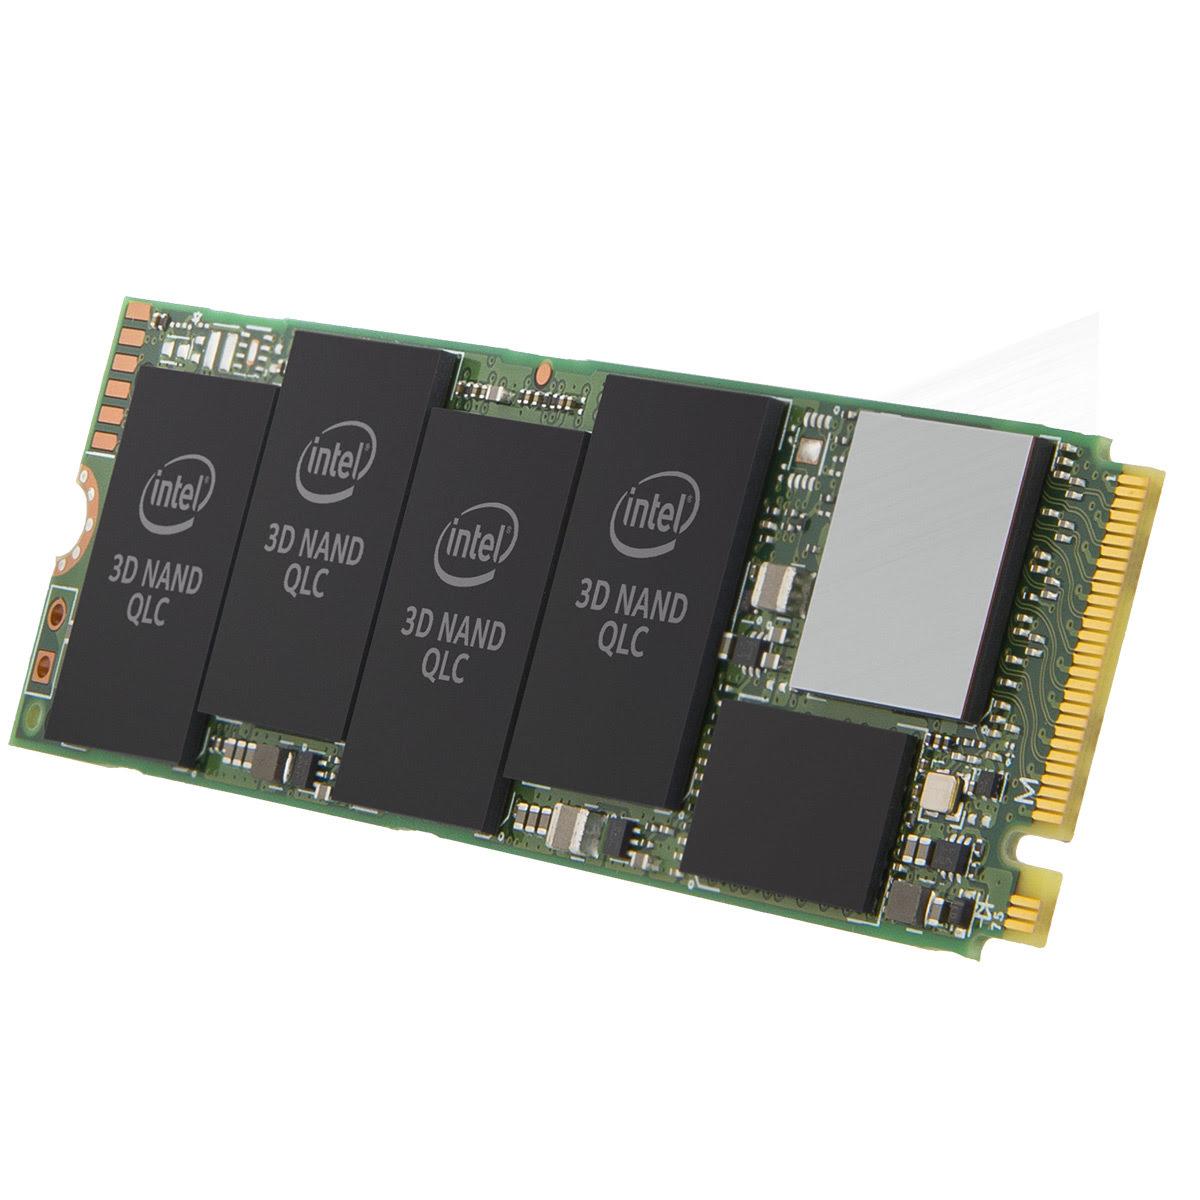 Intel 660P 480-525Go M.2 - Disque SSD Intel - Cybertek.fr - 0